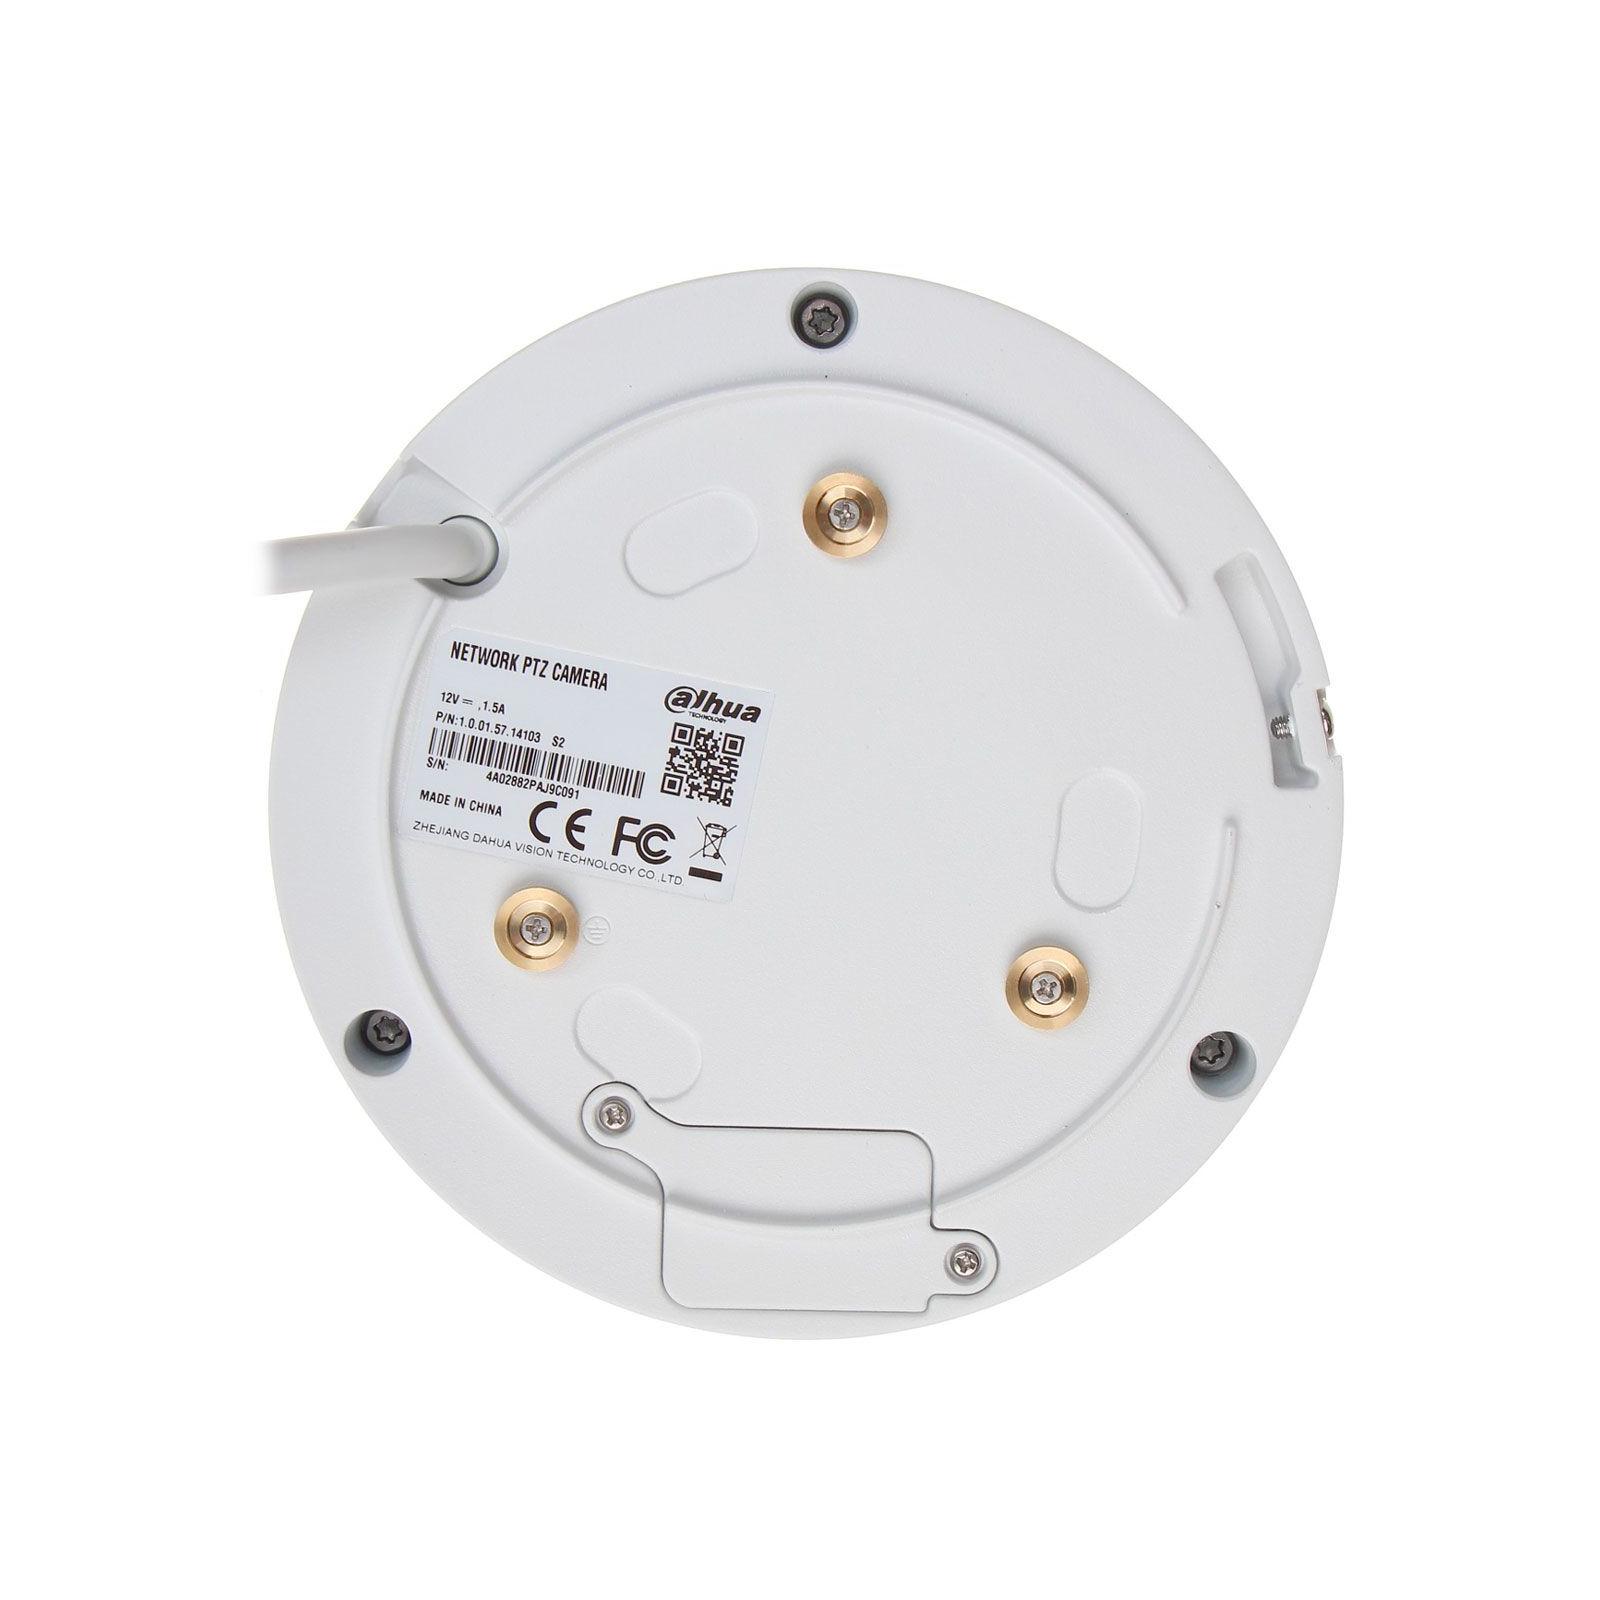 Камера видеонаблюдения Dahua DH-SD1A203T-GN-W (PTZ 3x) изображение 3